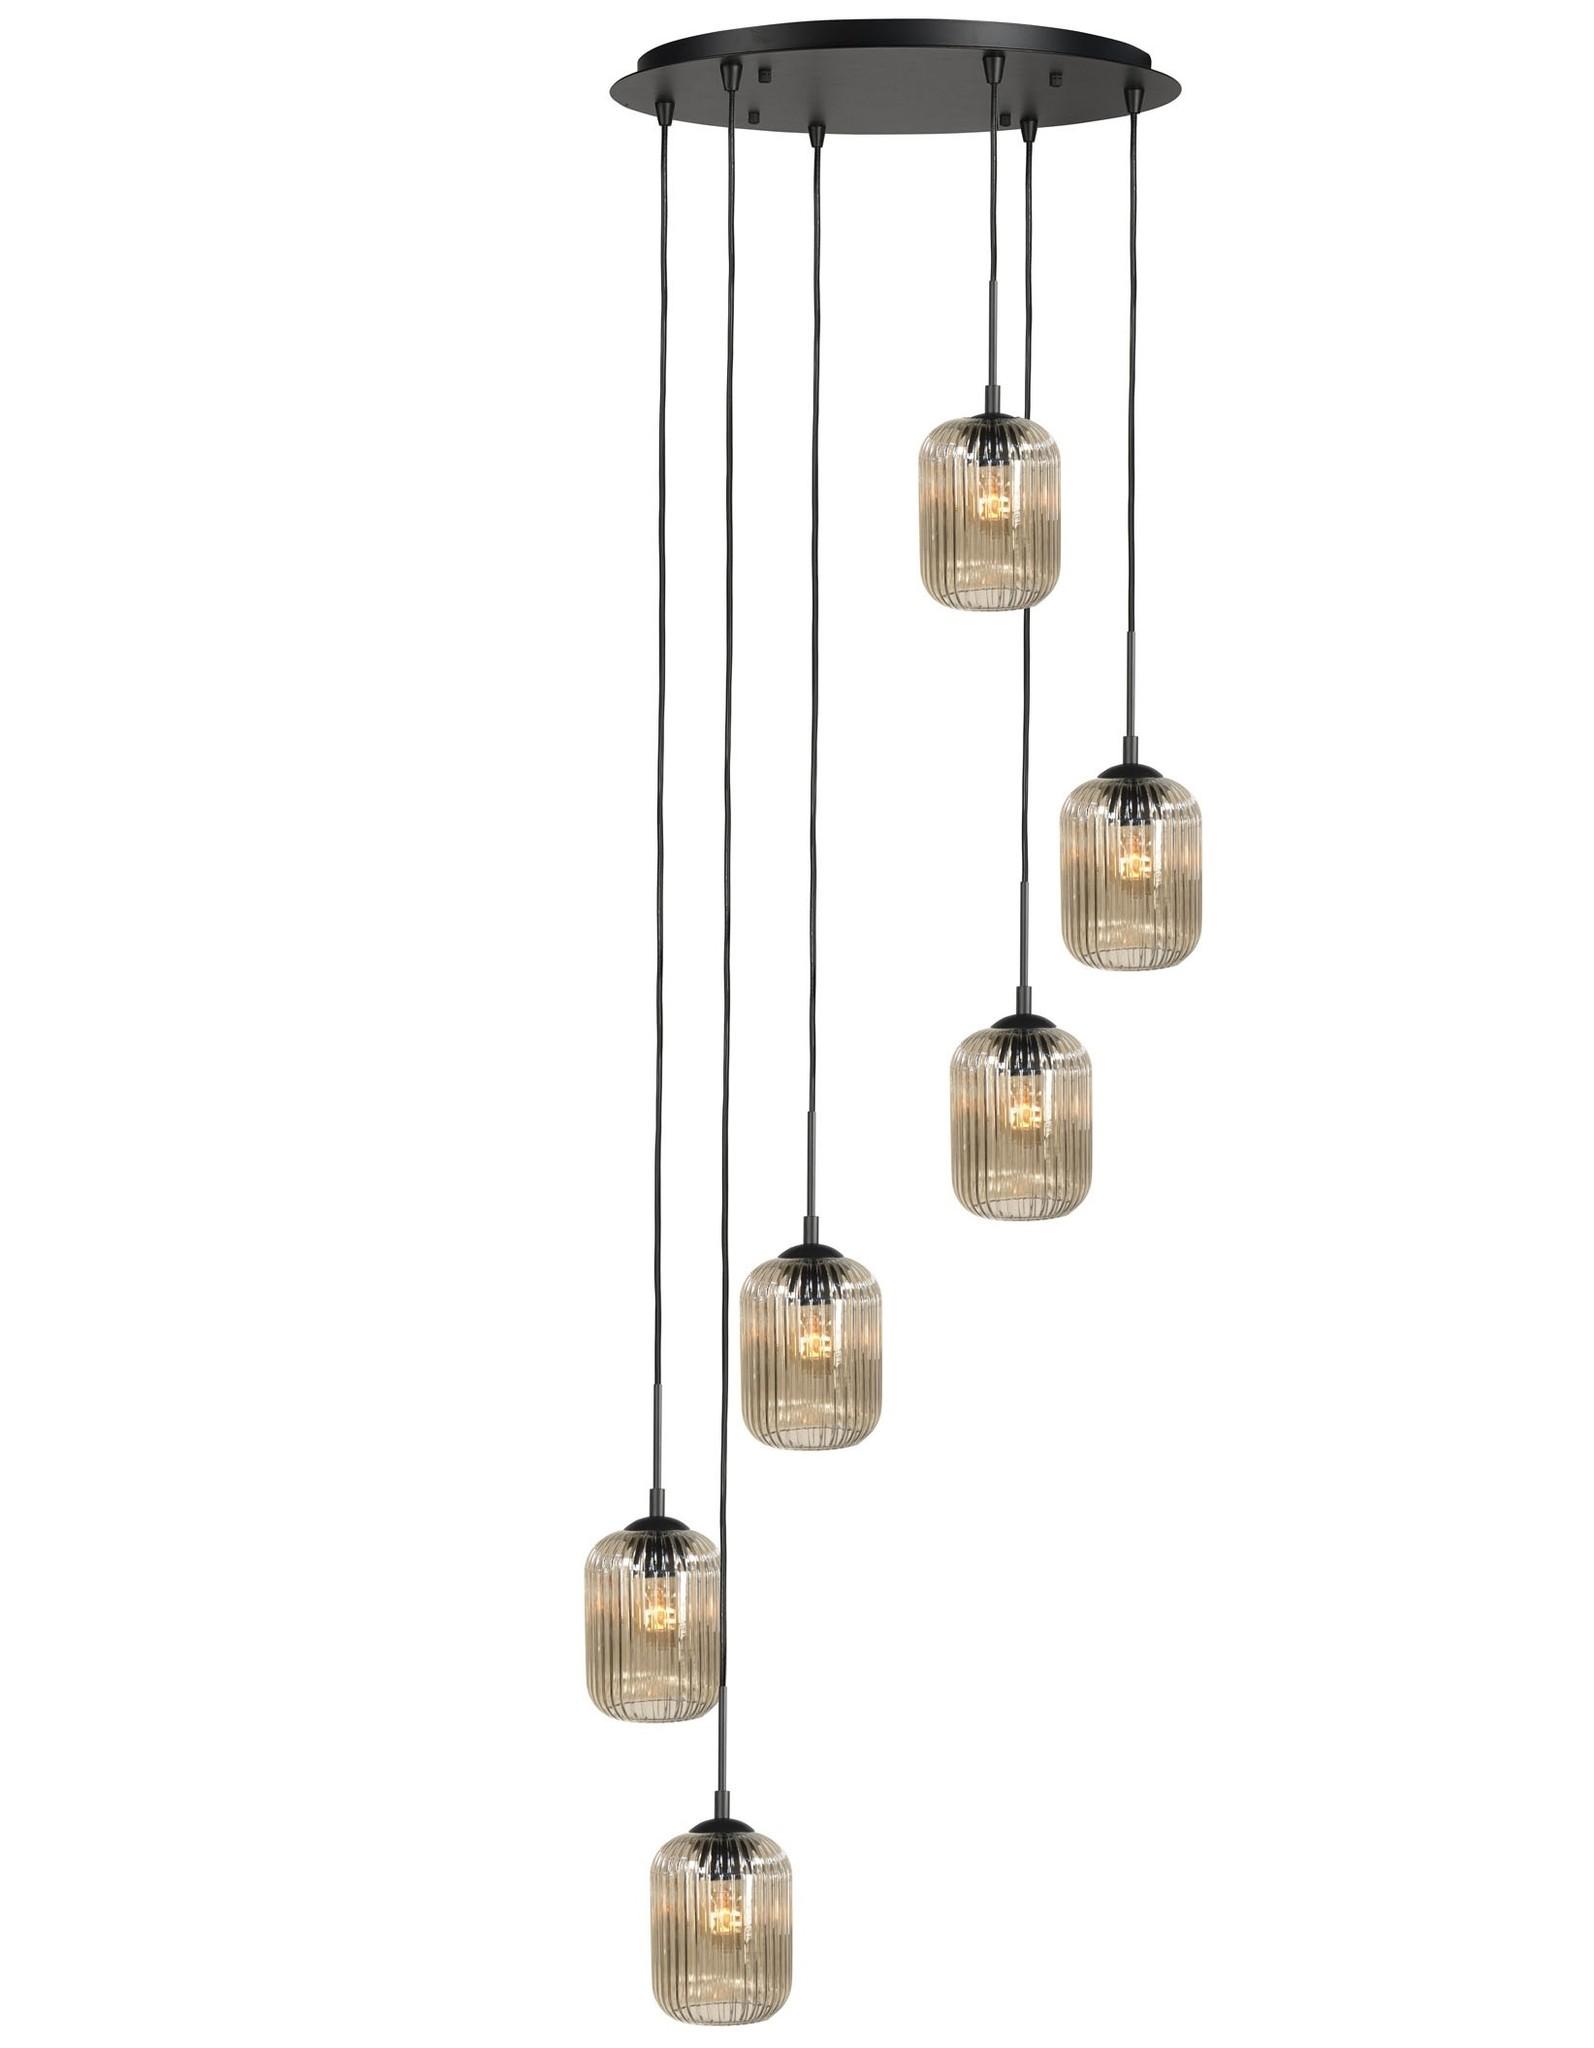 Hanglamp Castel Amber 6 Lichts 50cm Ø |  | 8718379036835